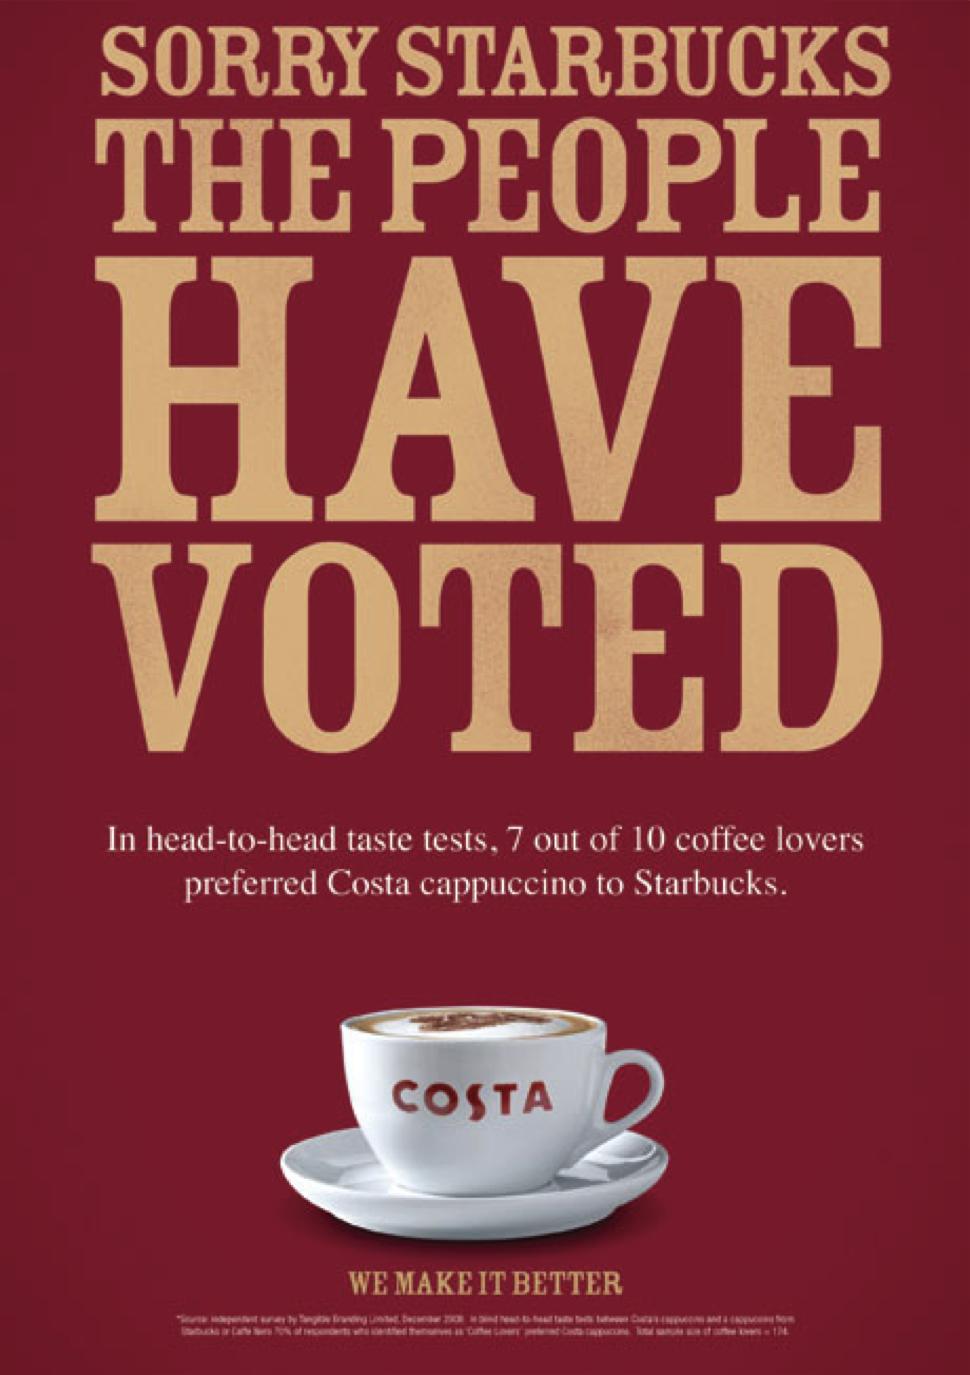 Rebranding Coffeeheaven